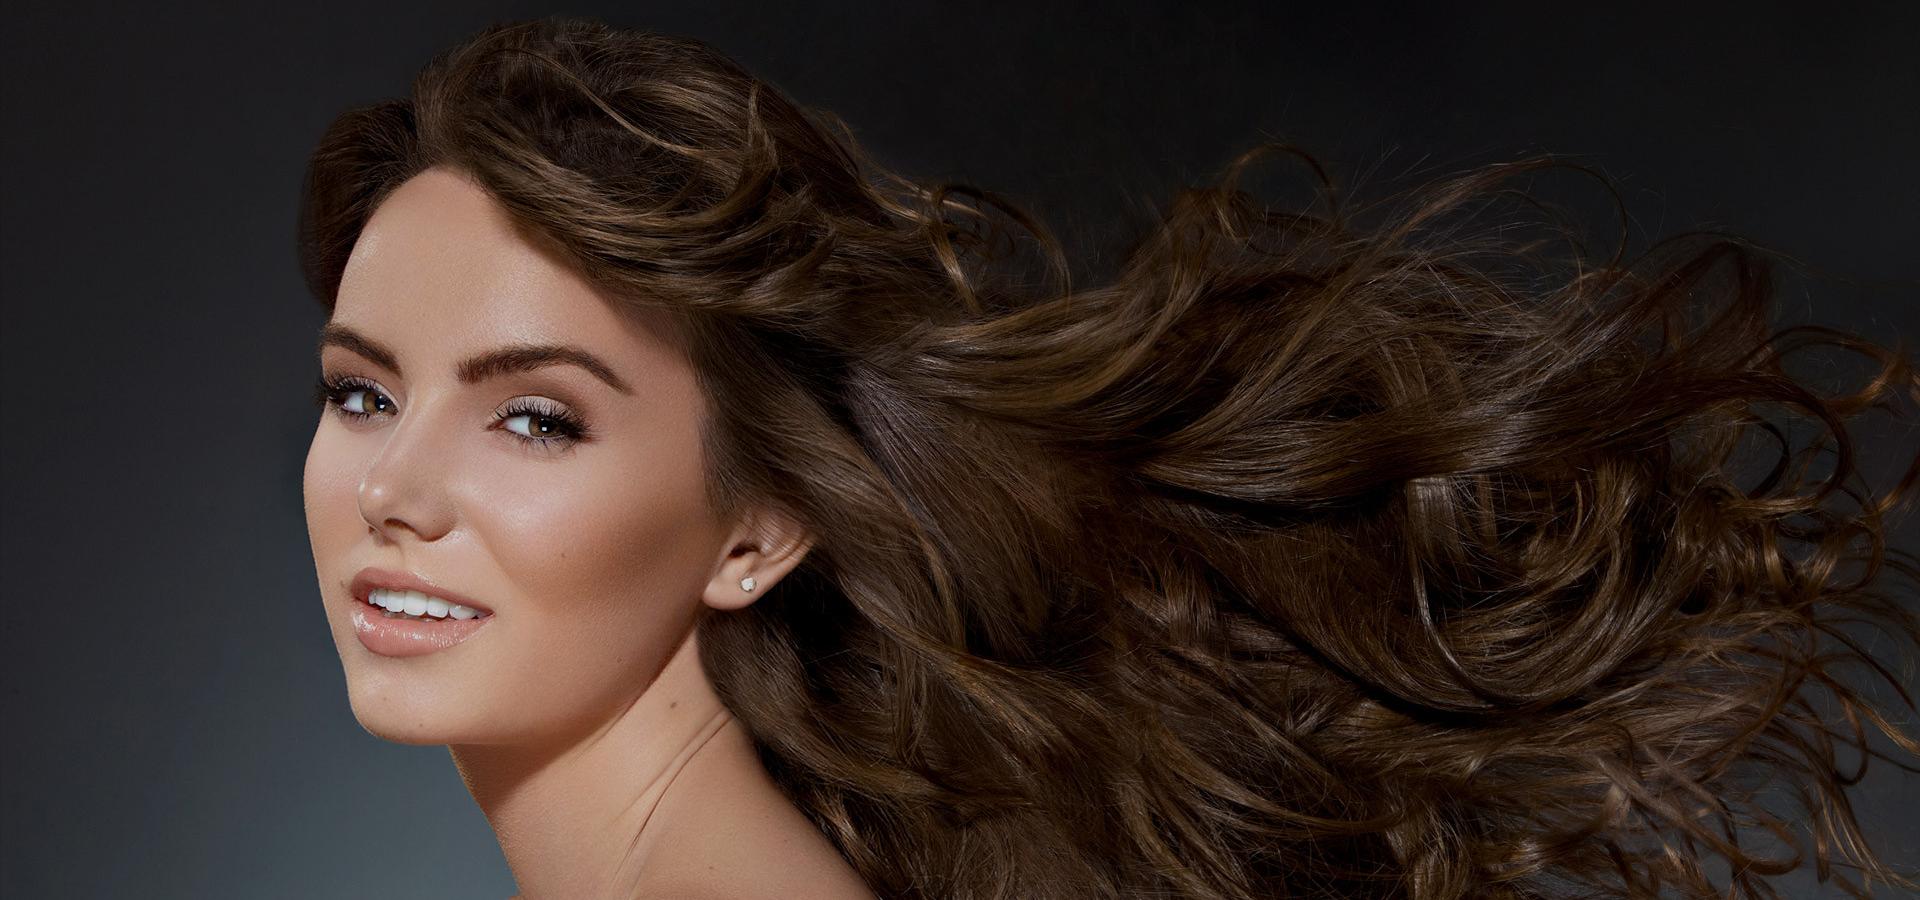 Trendiest Hair Salon In Toronto Ontario D2e Hair Boutique